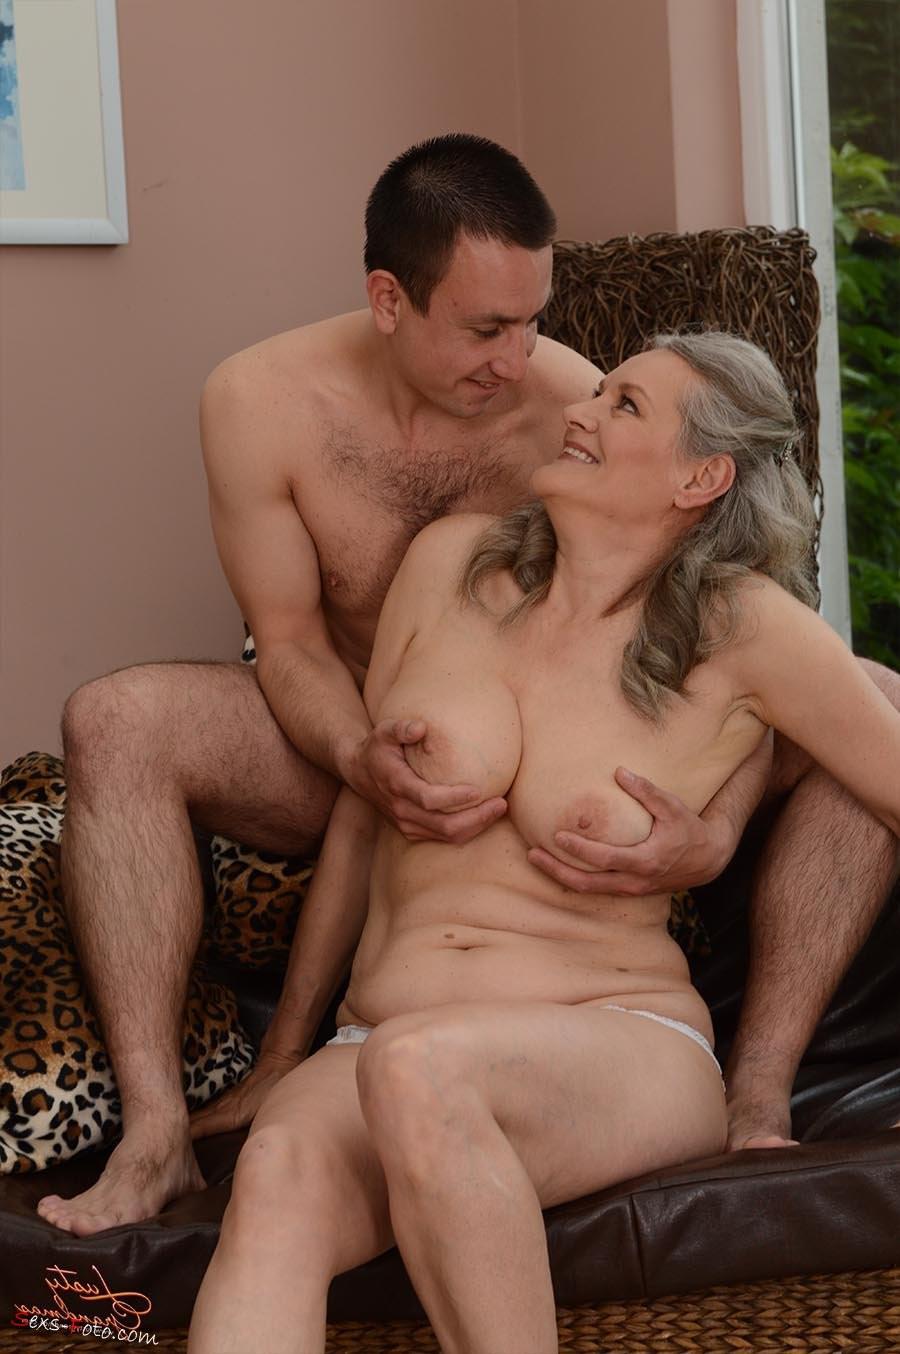 big natural oiled tits – Pornostar